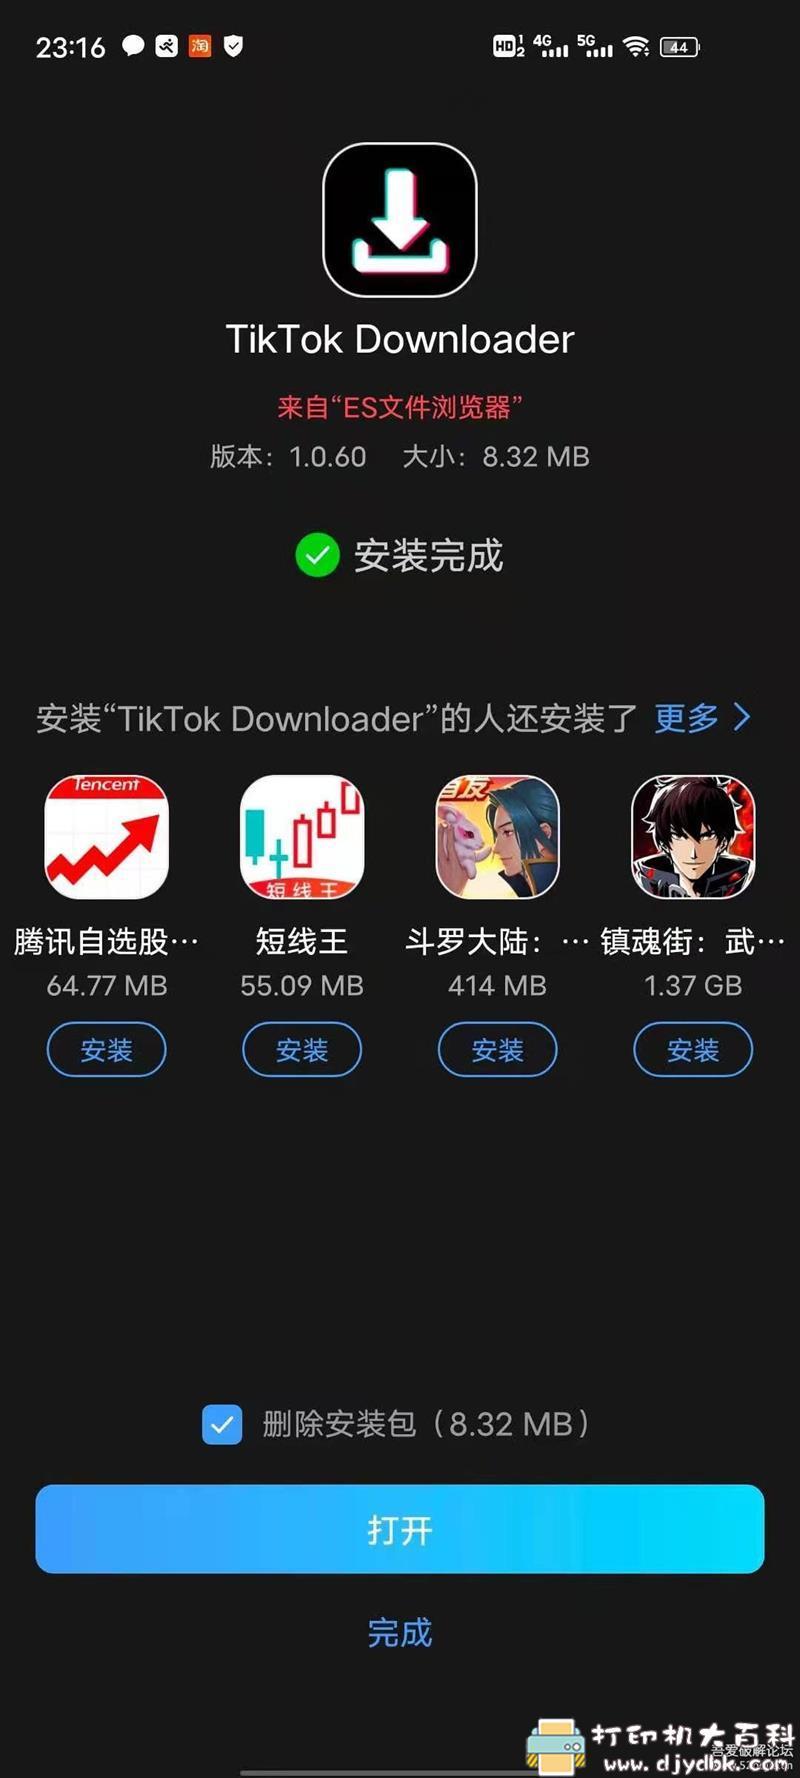 [Android]TikTok的视频下载器-无水印v1.0.60(无广告) 配图 No.1